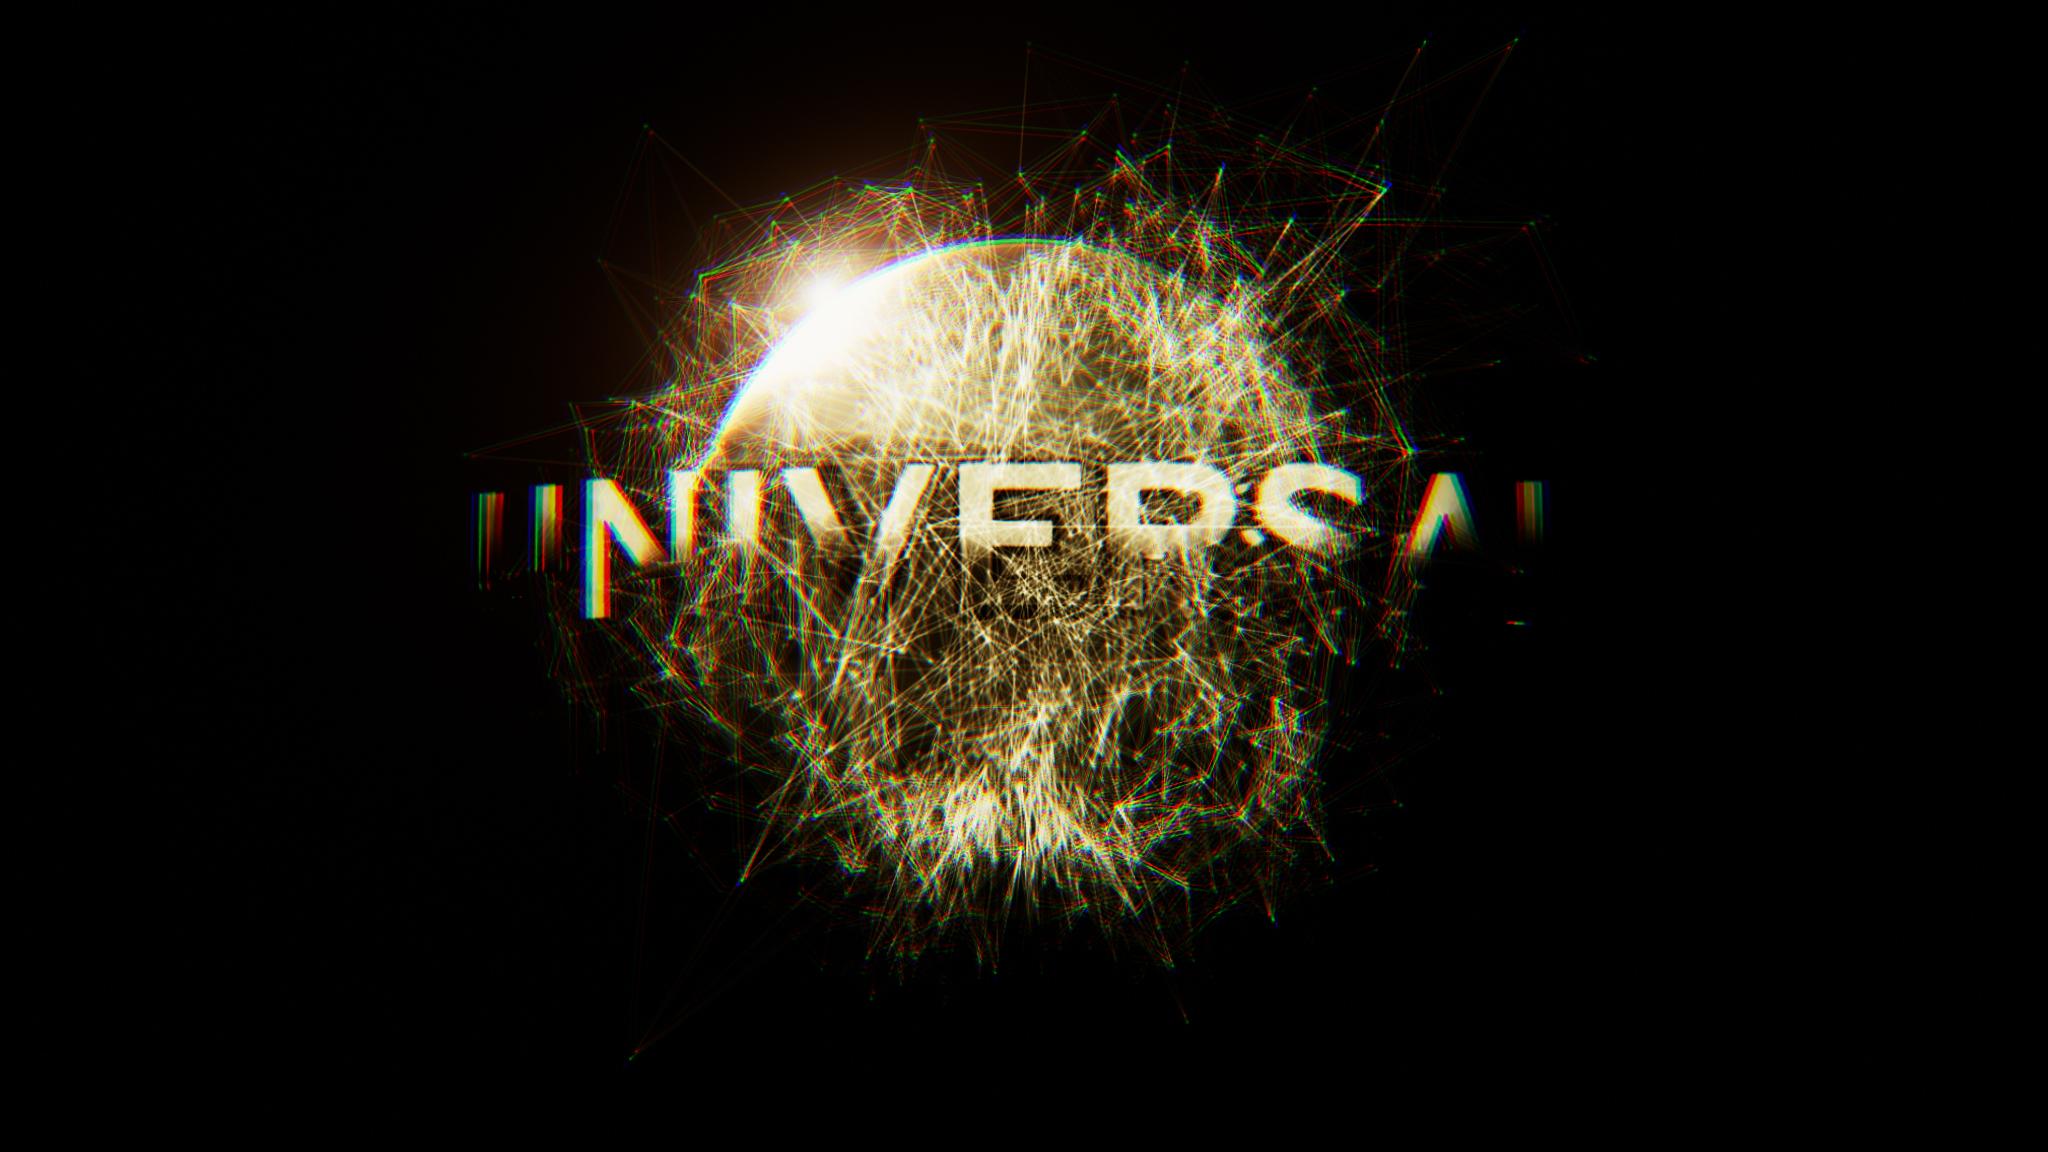 DARK_UNI_01_UNIVERSAL_v06c_AK_HD copy.jpg